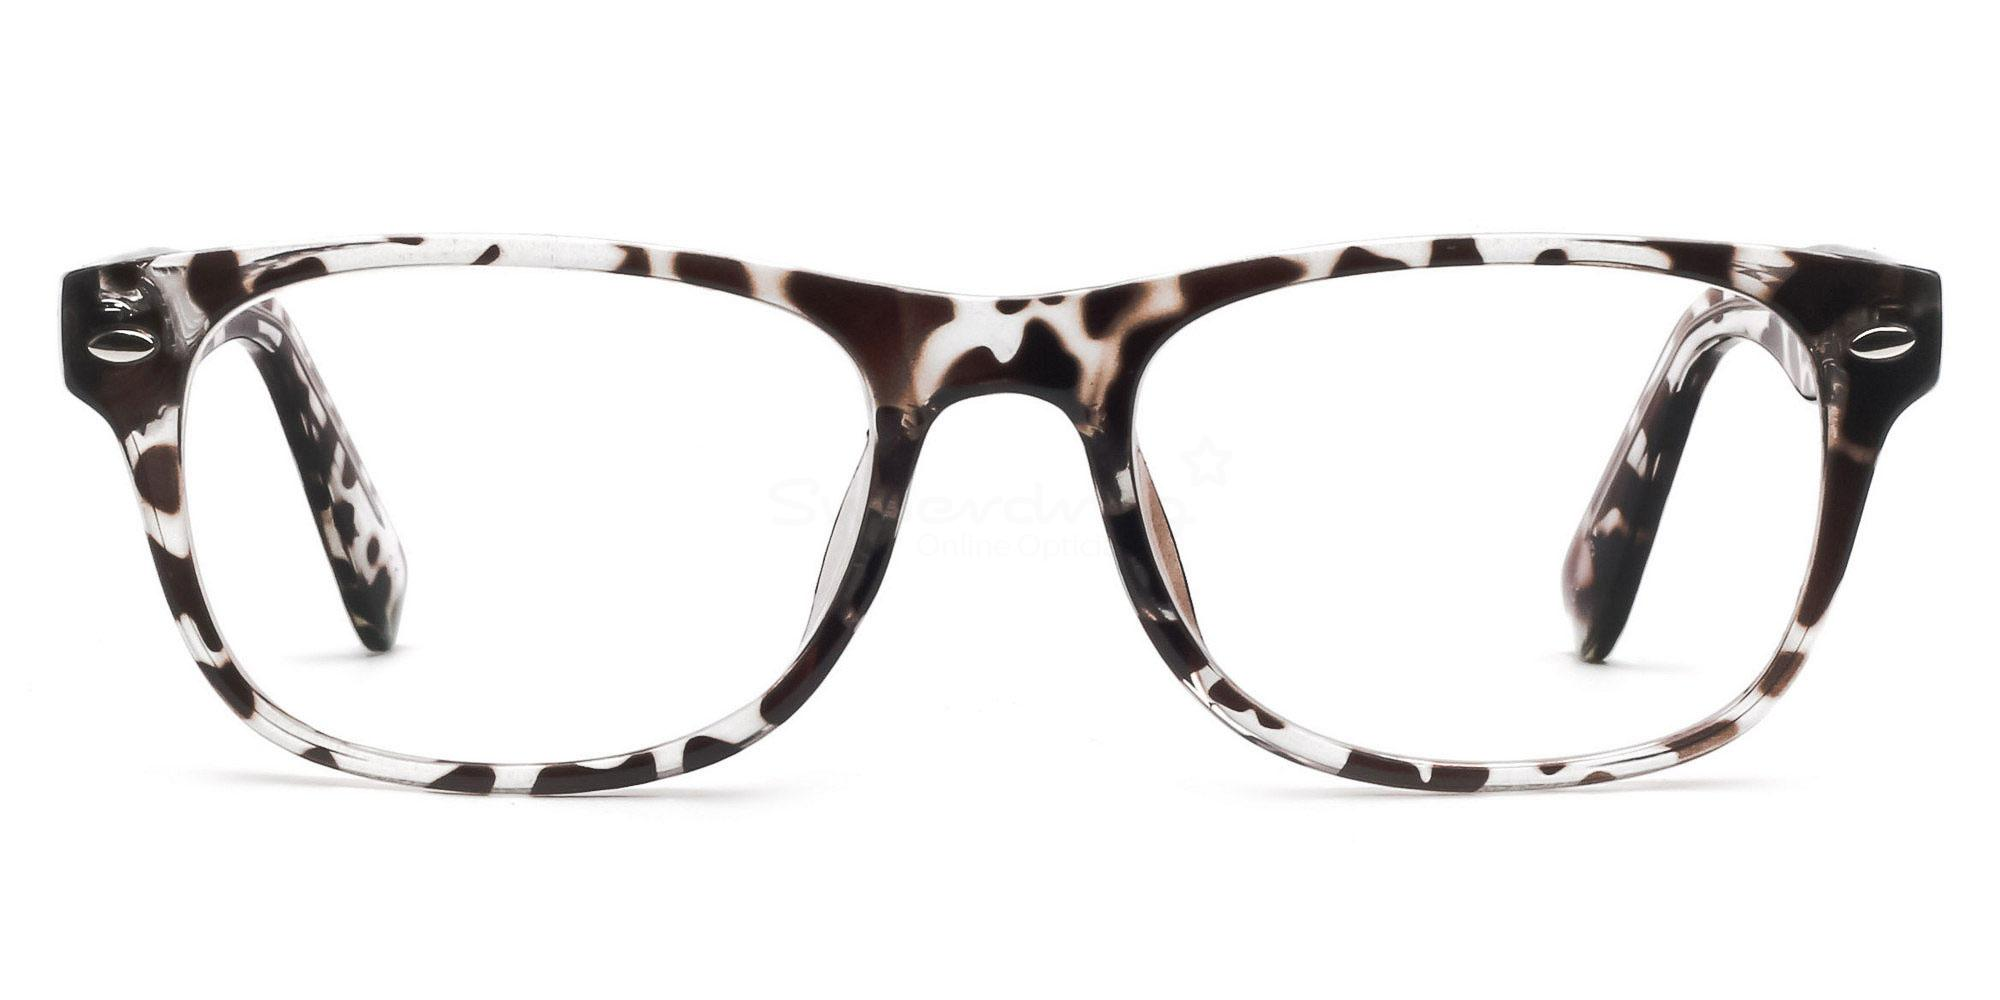 C03 P2383 - Animal Print Glasses, Helium